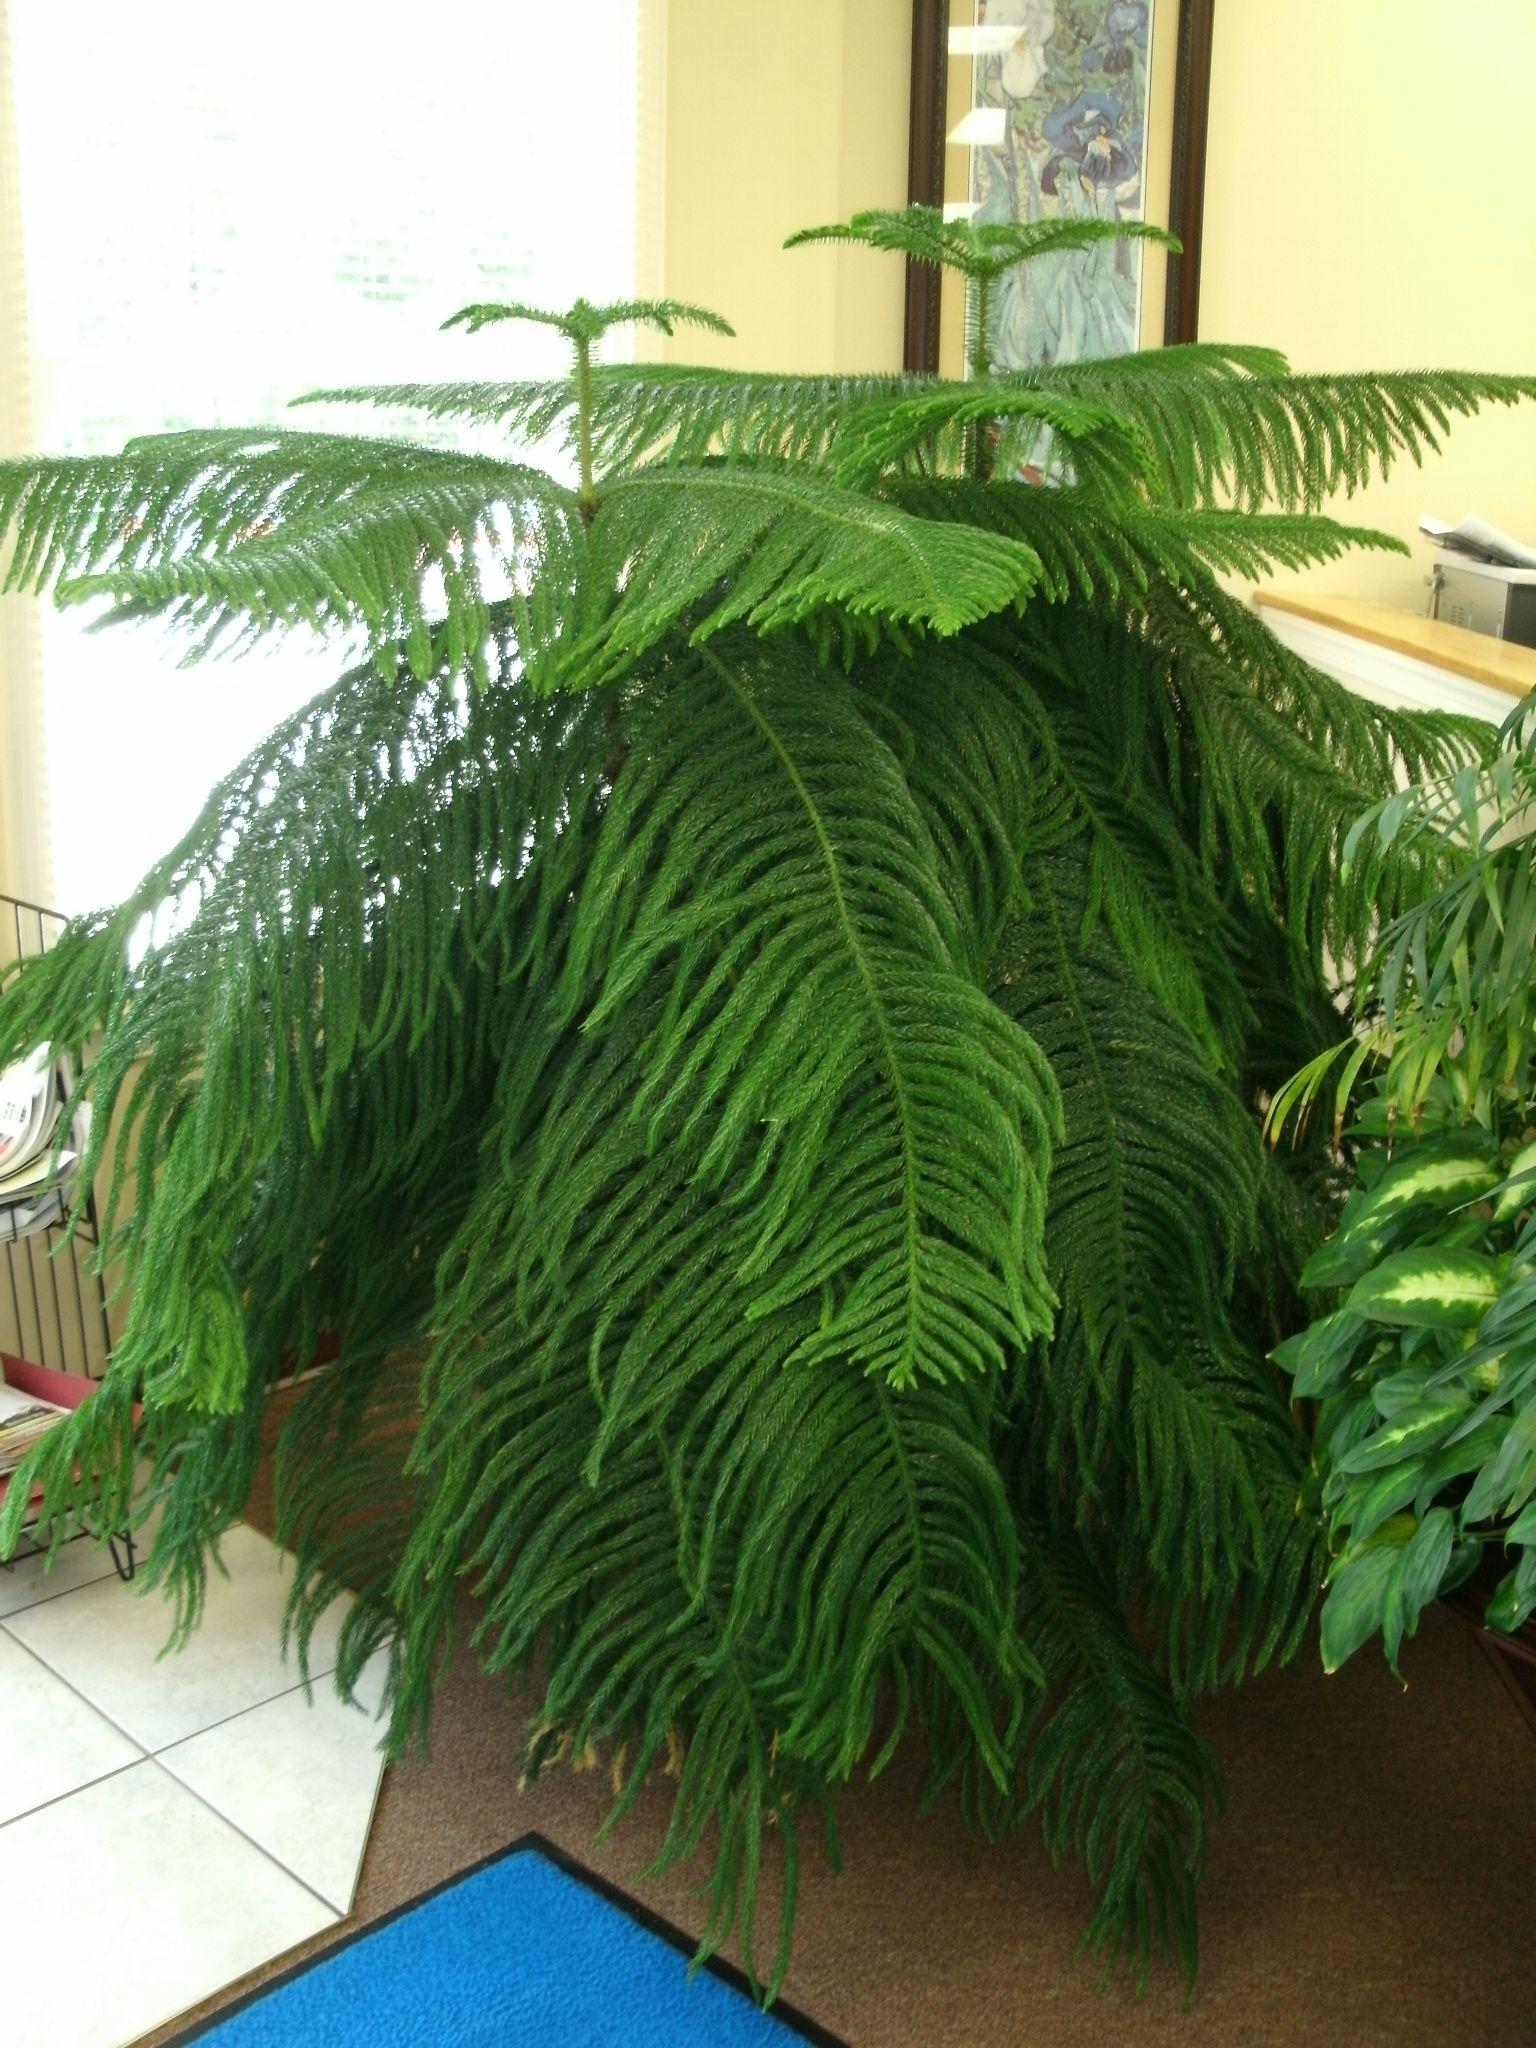 on spidar plant norfolk pine house